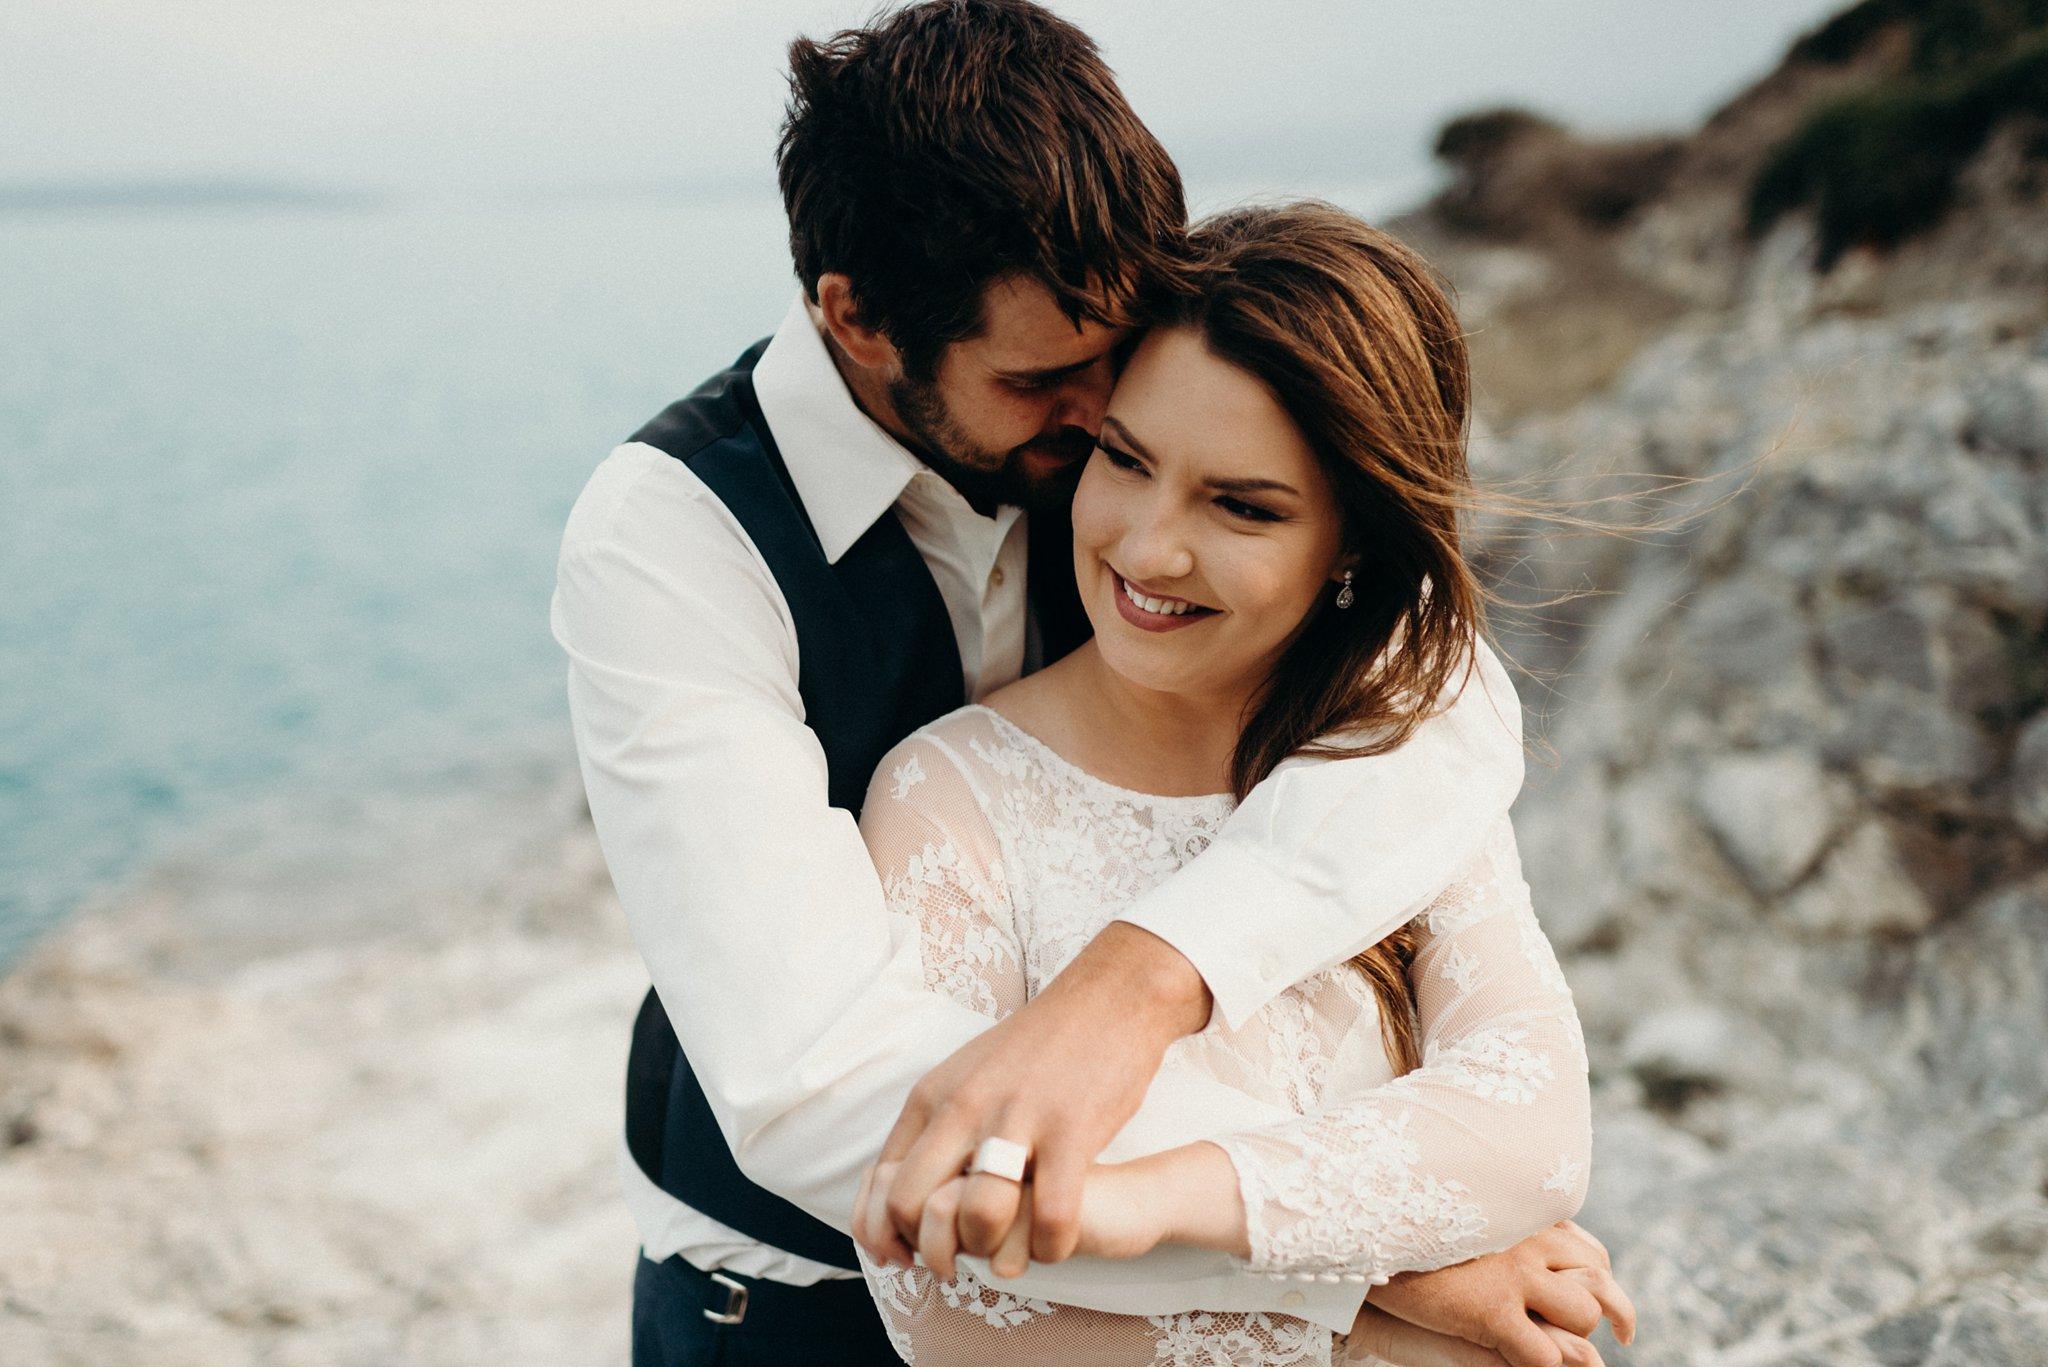 kaihla_tonai_intimate_wedding_elopement_photographer_6751.jpg